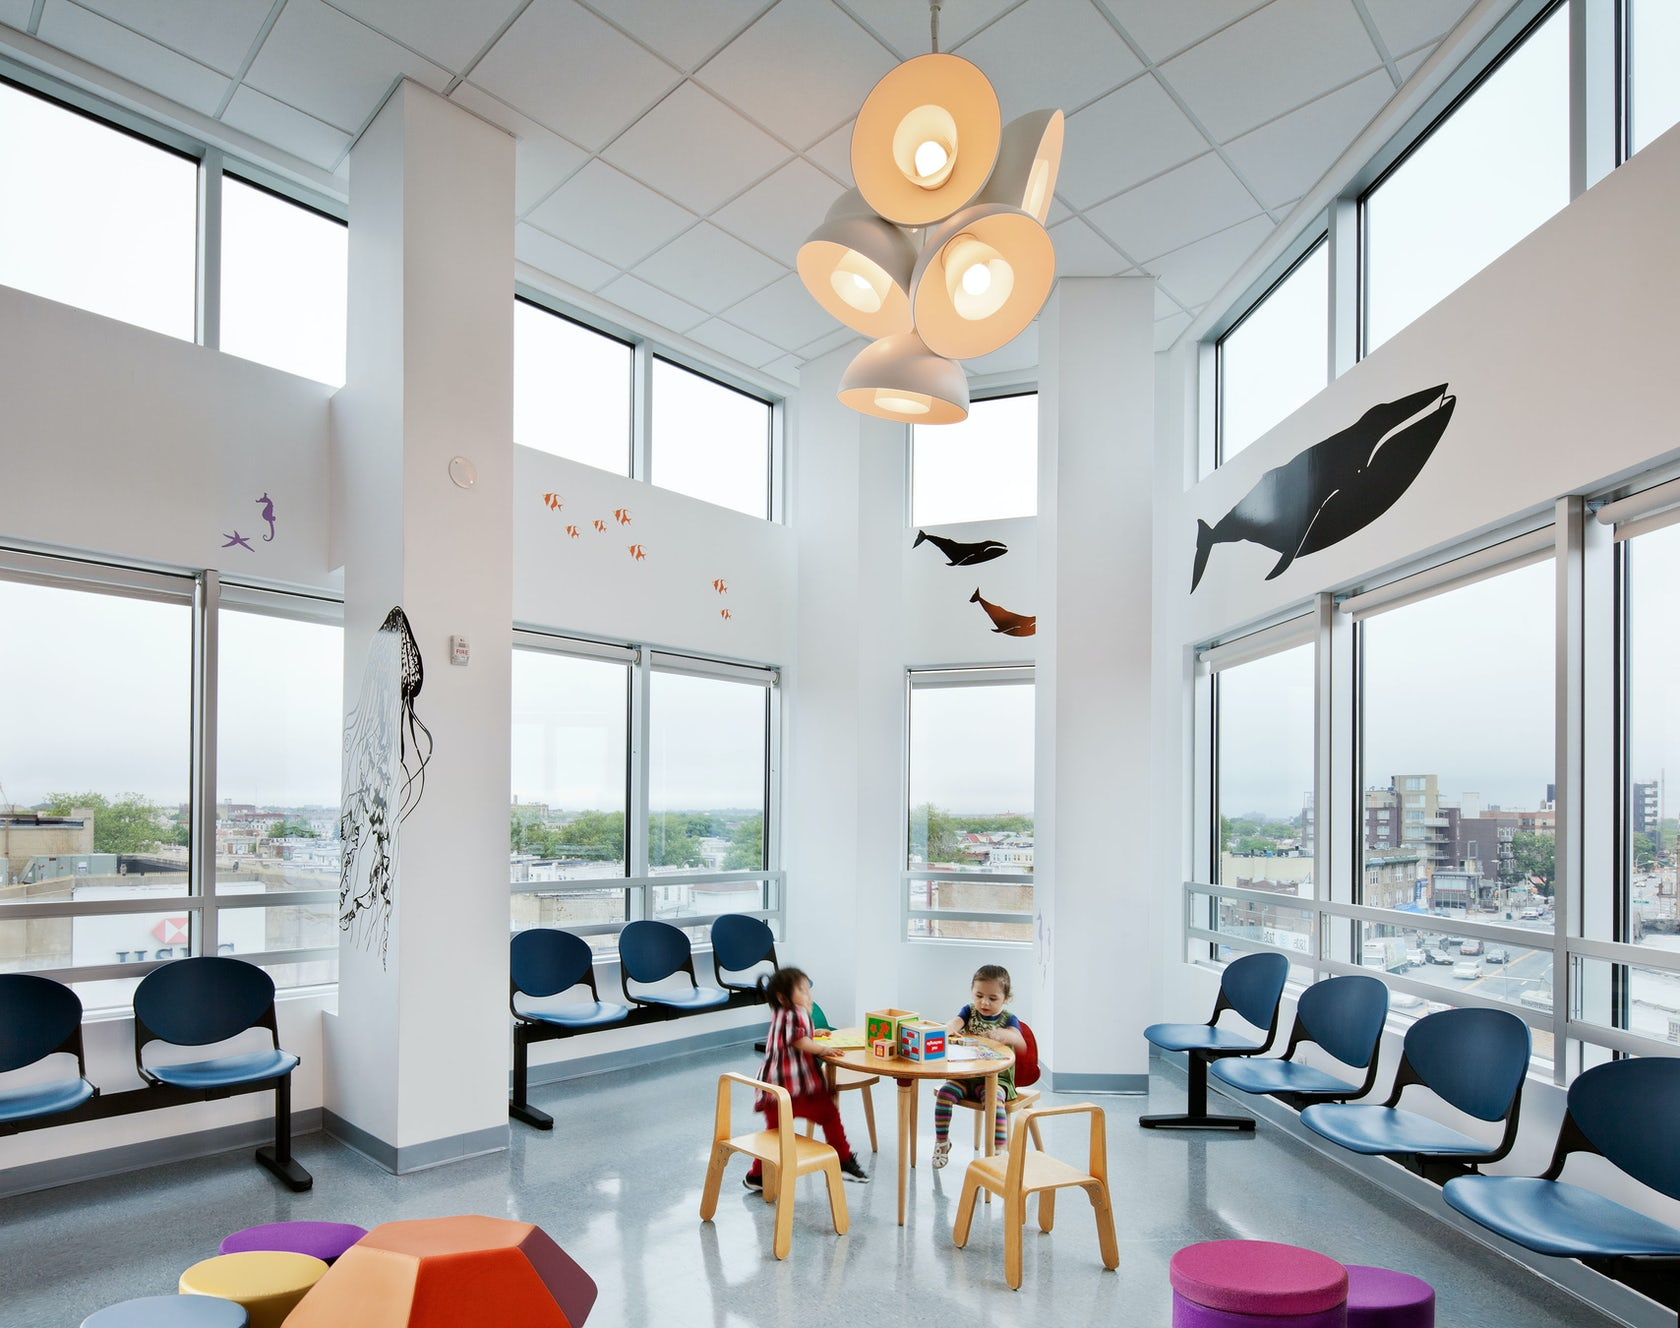 Maimonides Medical Center Department of Pediatrics on Architizer